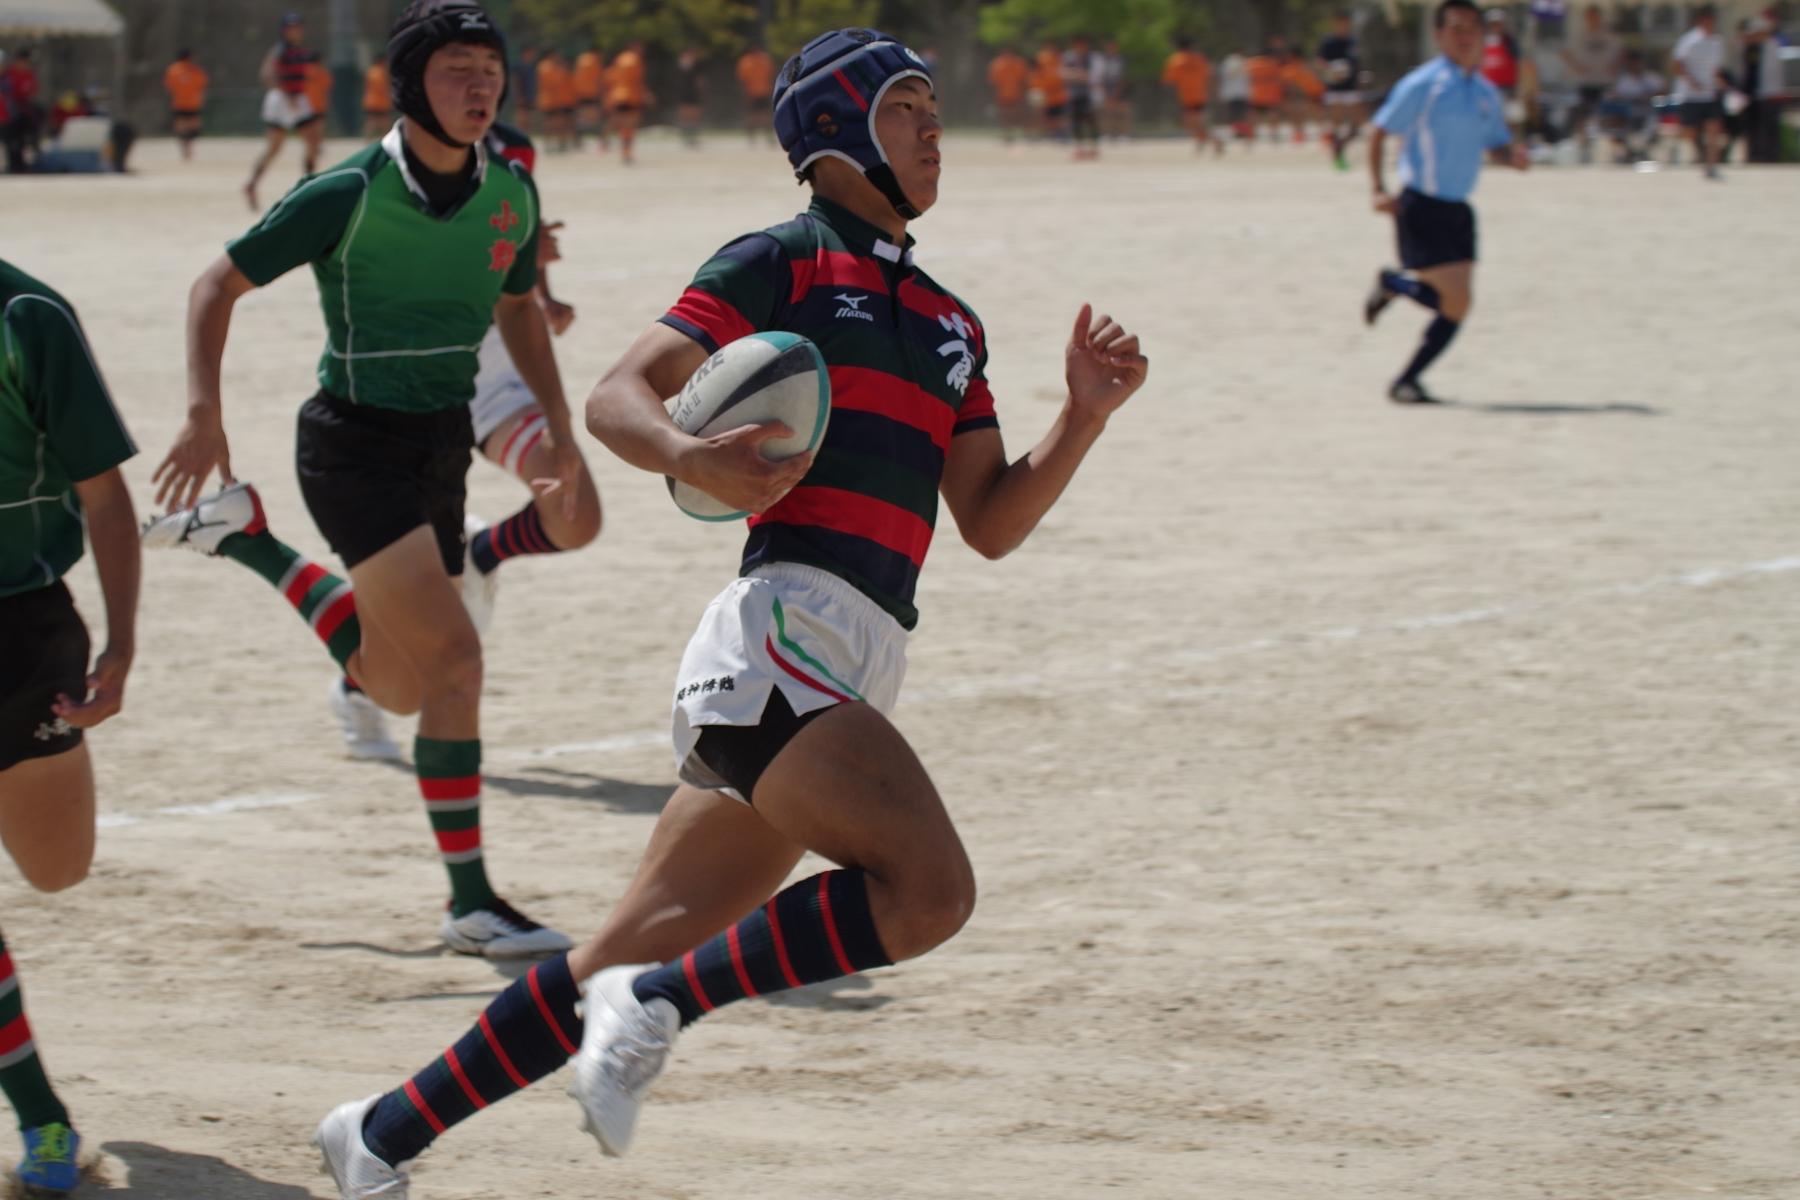 http://kokura-rugby.sakura.ne.jp/180527_100436_0022.jpg